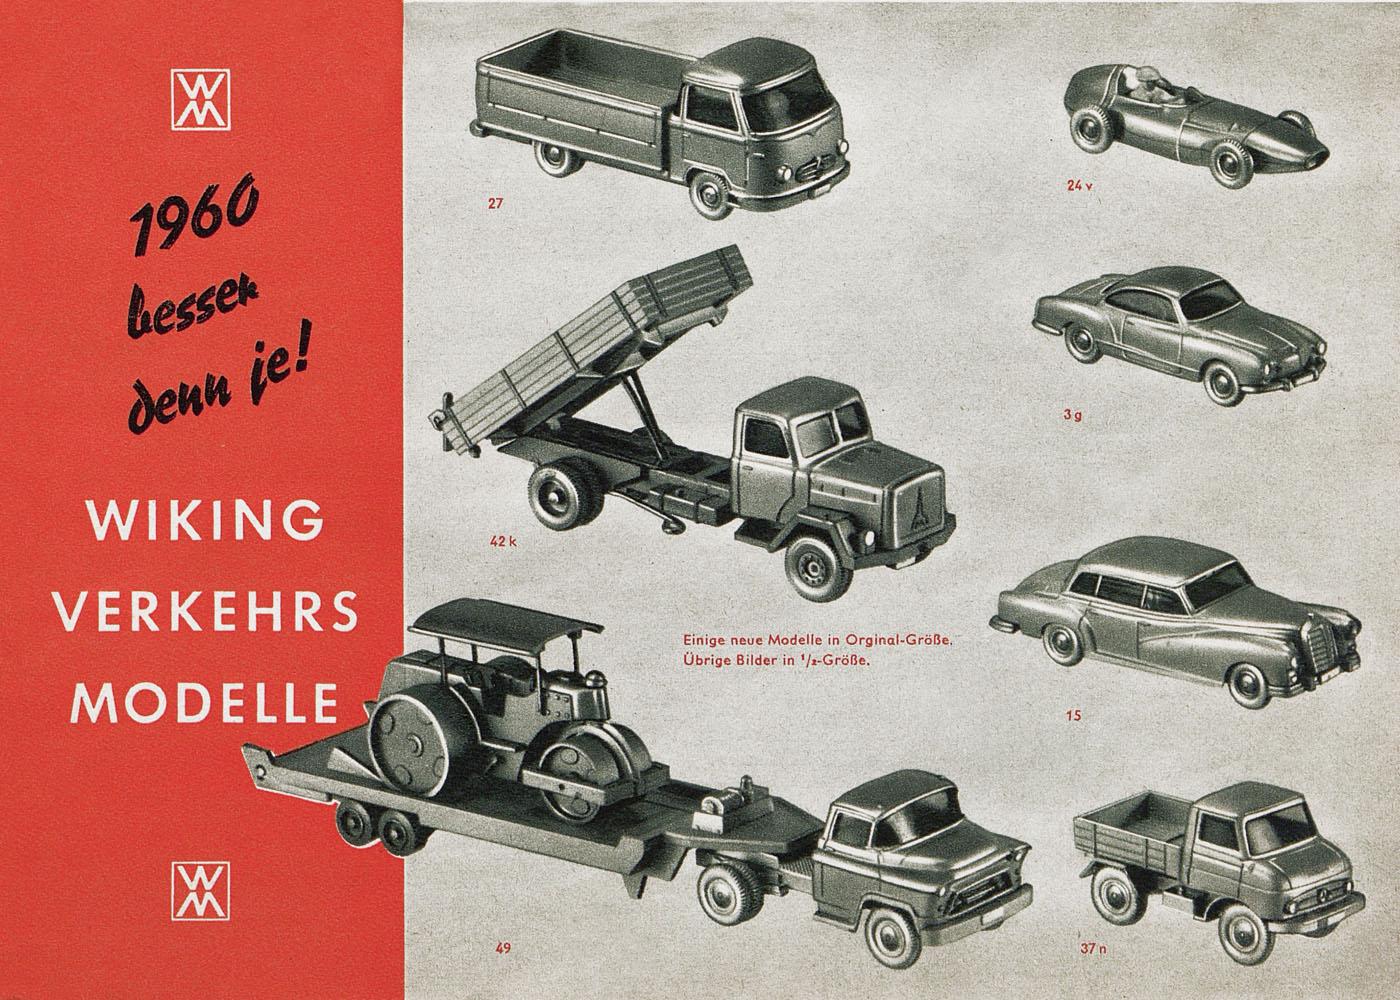 conrad antiquario katalogarchiv wiking verkehrsmodelle 1960. Black Bedroom Furniture Sets. Home Design Ideas